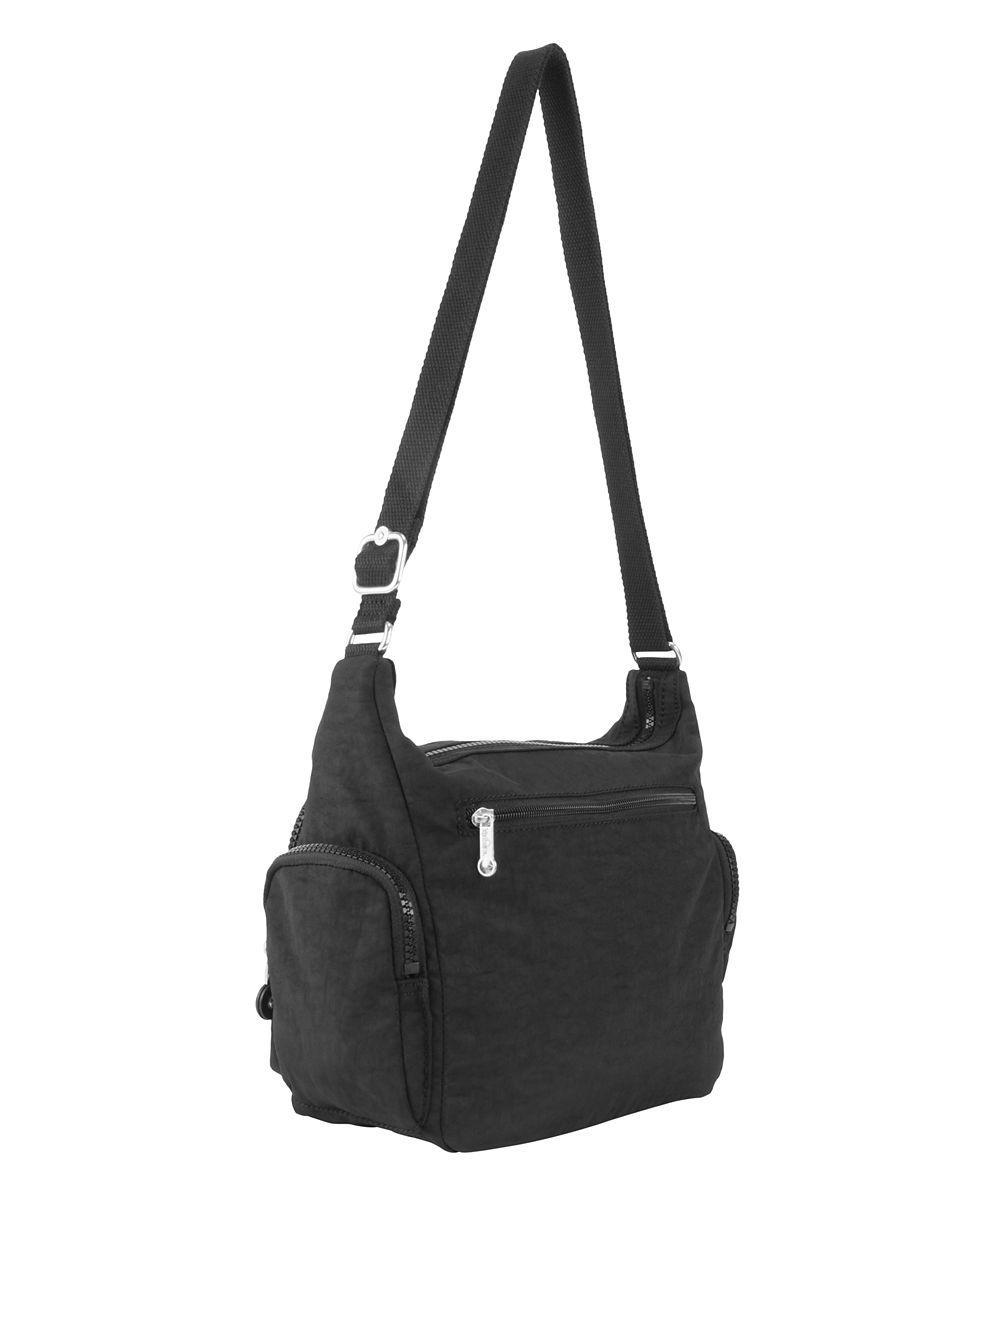 Kipling Black Small Gabbie Crossbody Bag Lyst View Fullscreen